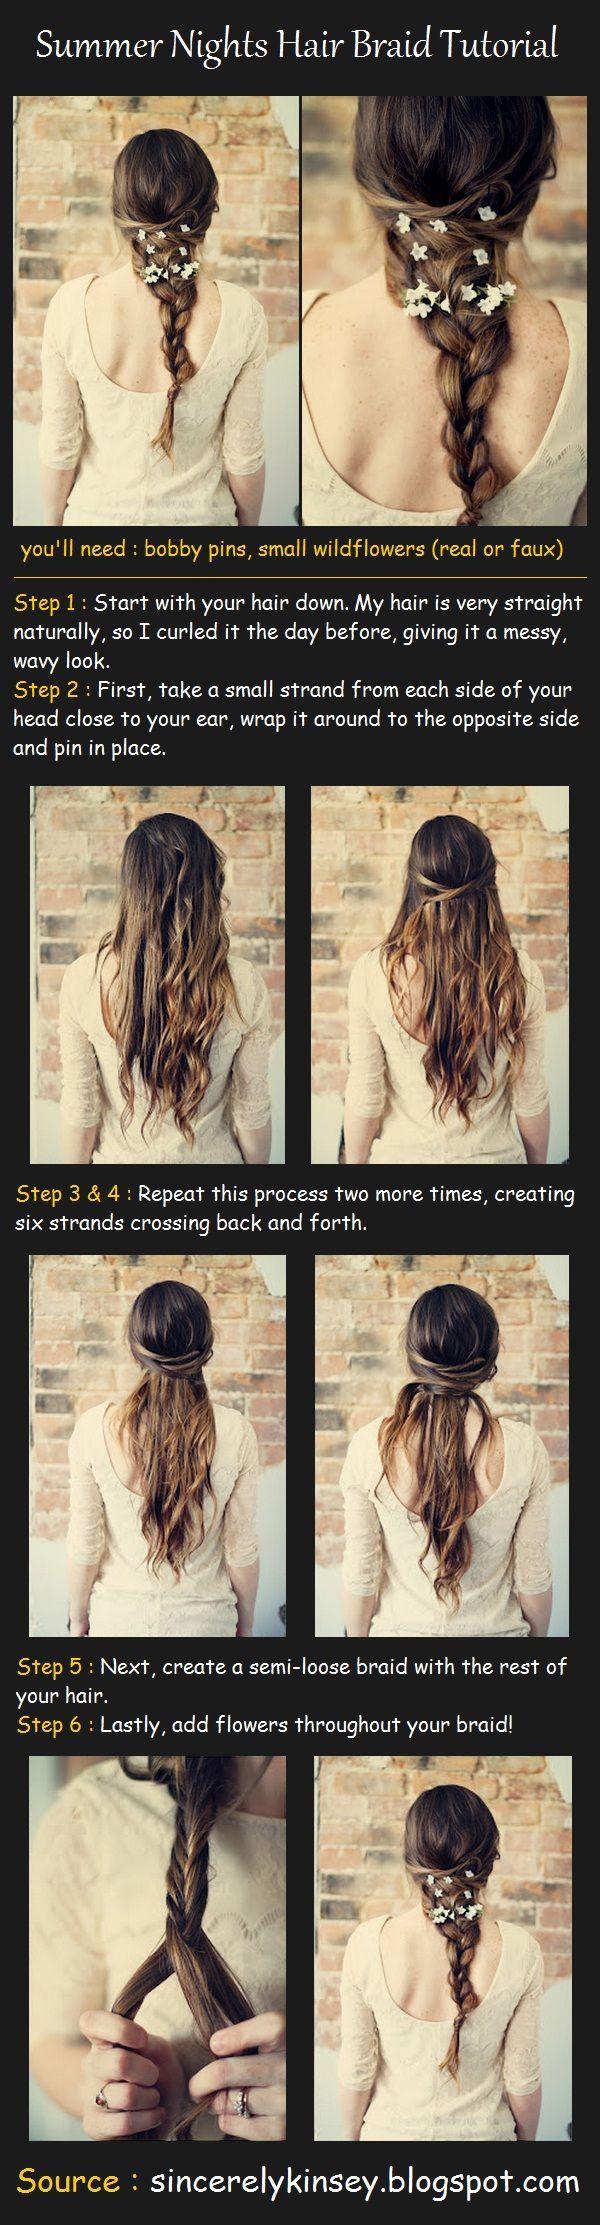 Summer Nights Hair Braid Tutorial | Beauty Tutorials